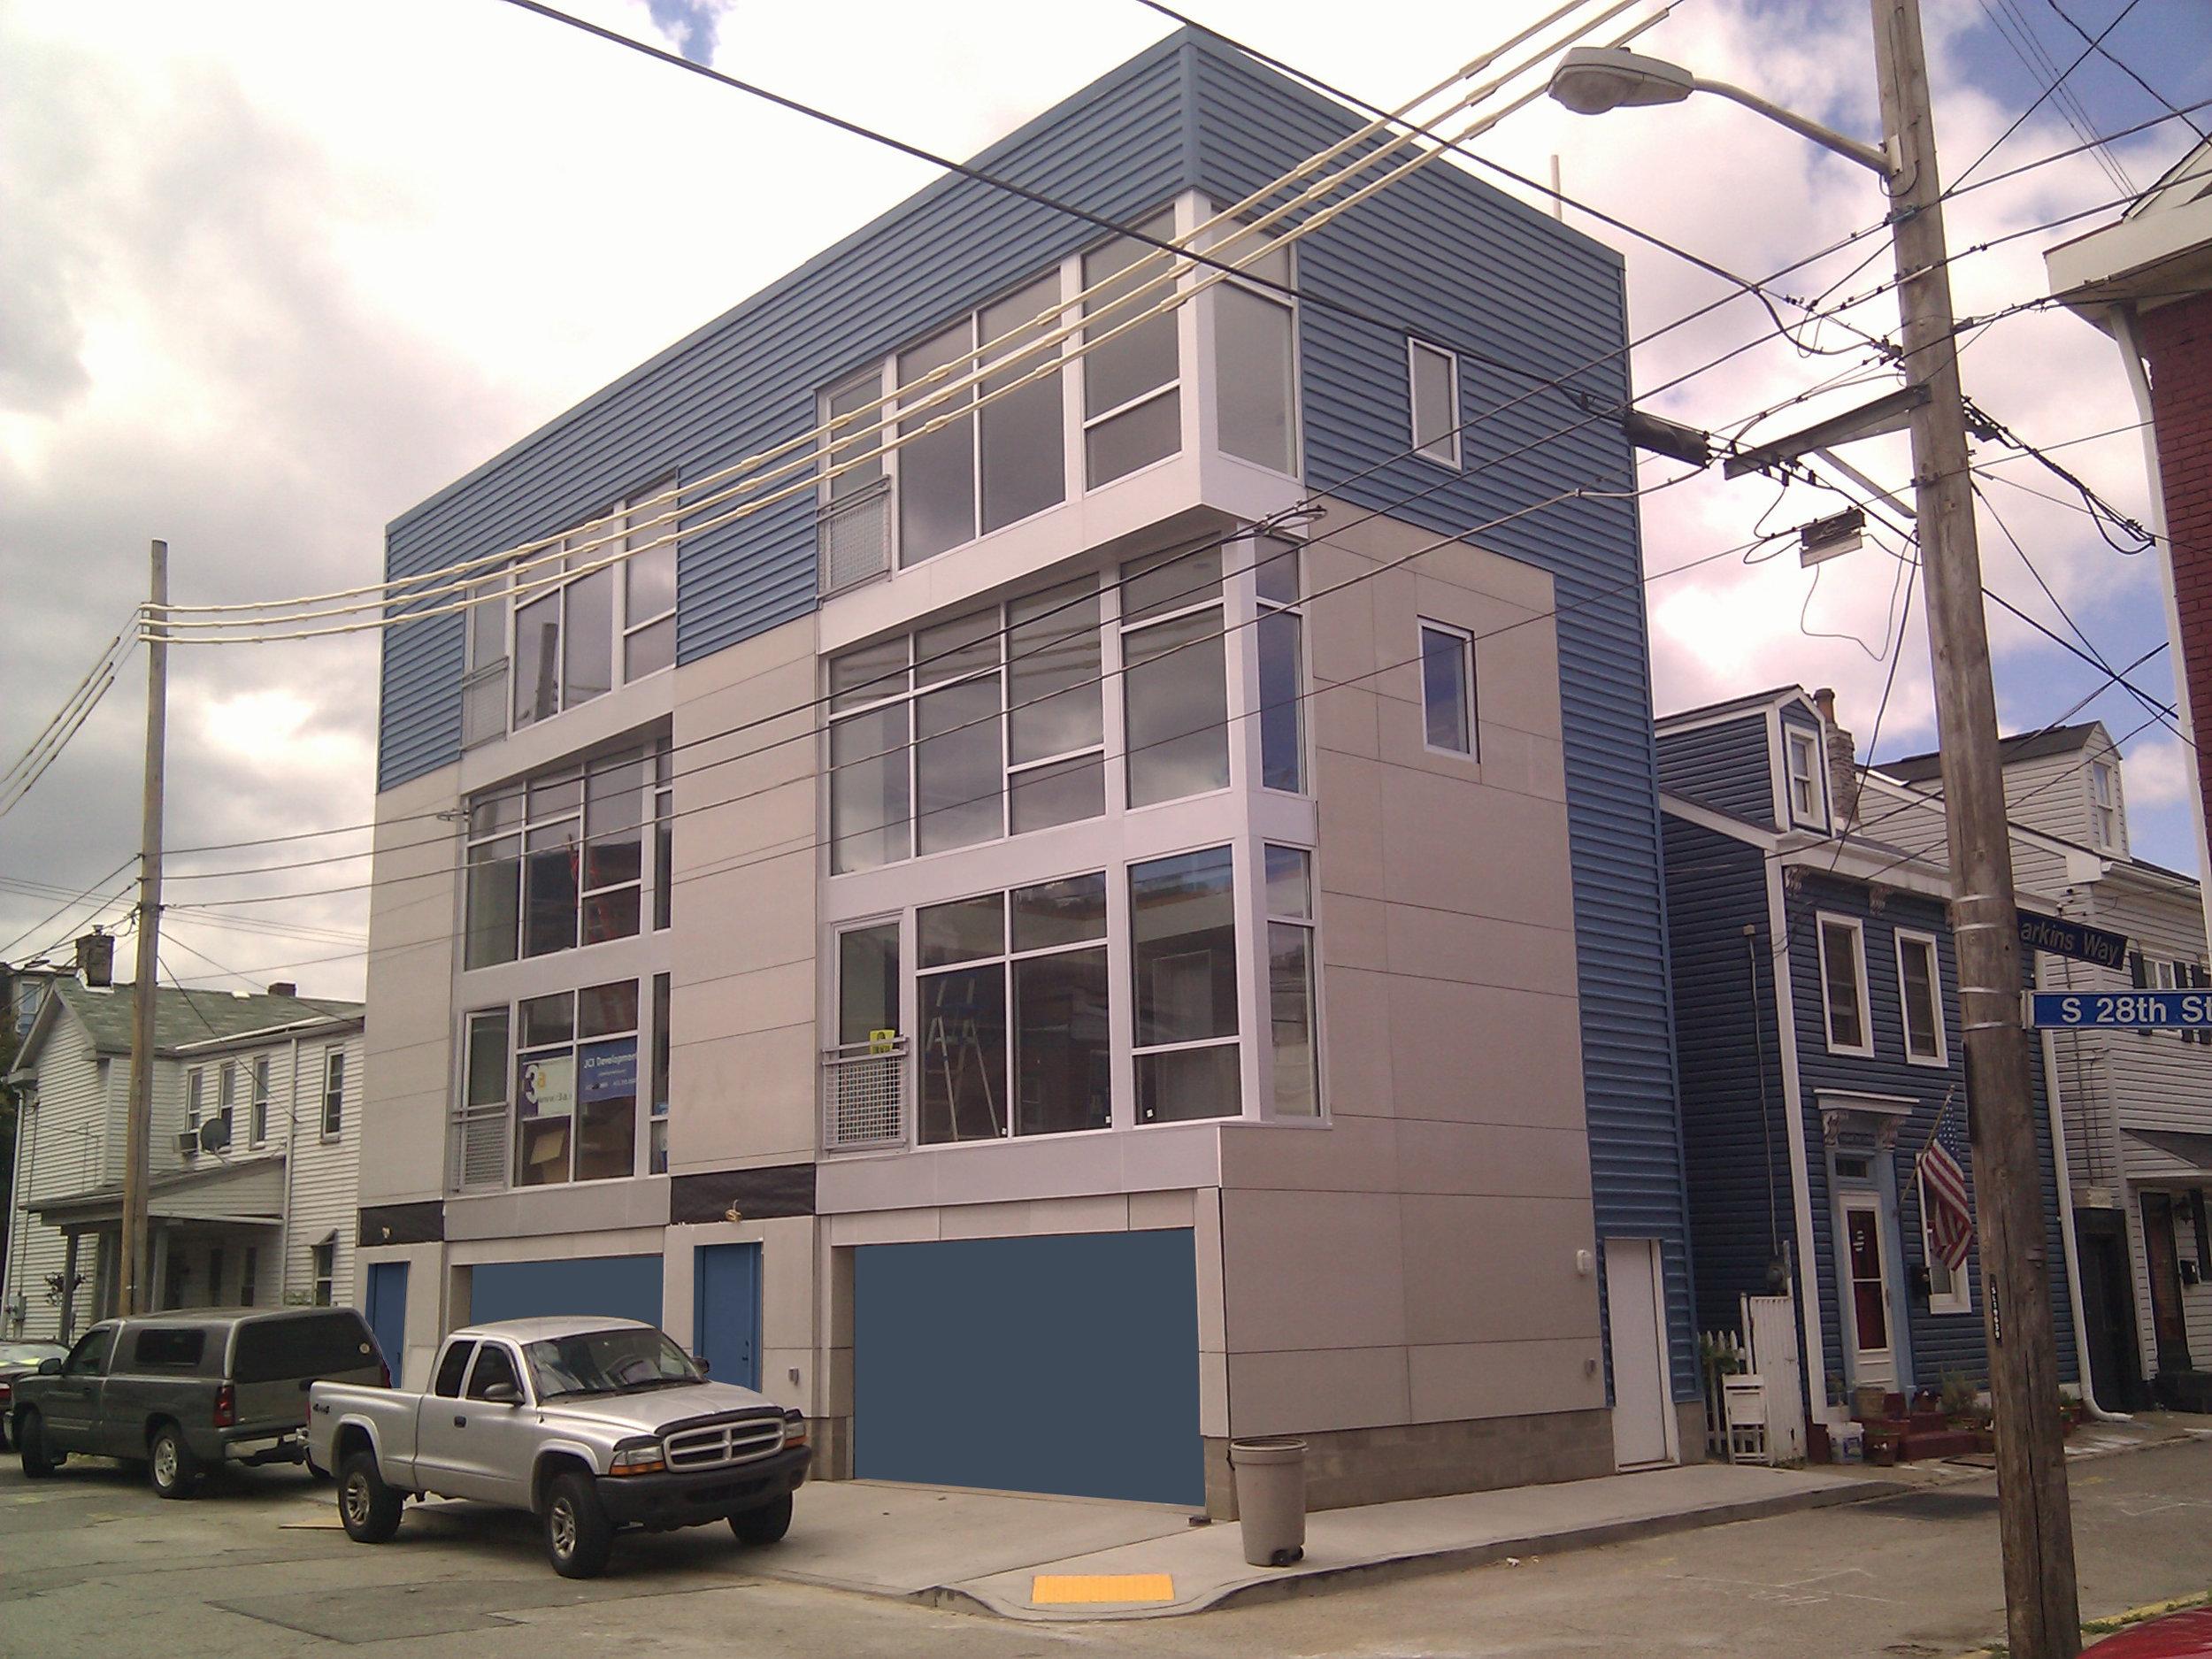 Larkins Way & 28th Street  Condominiums